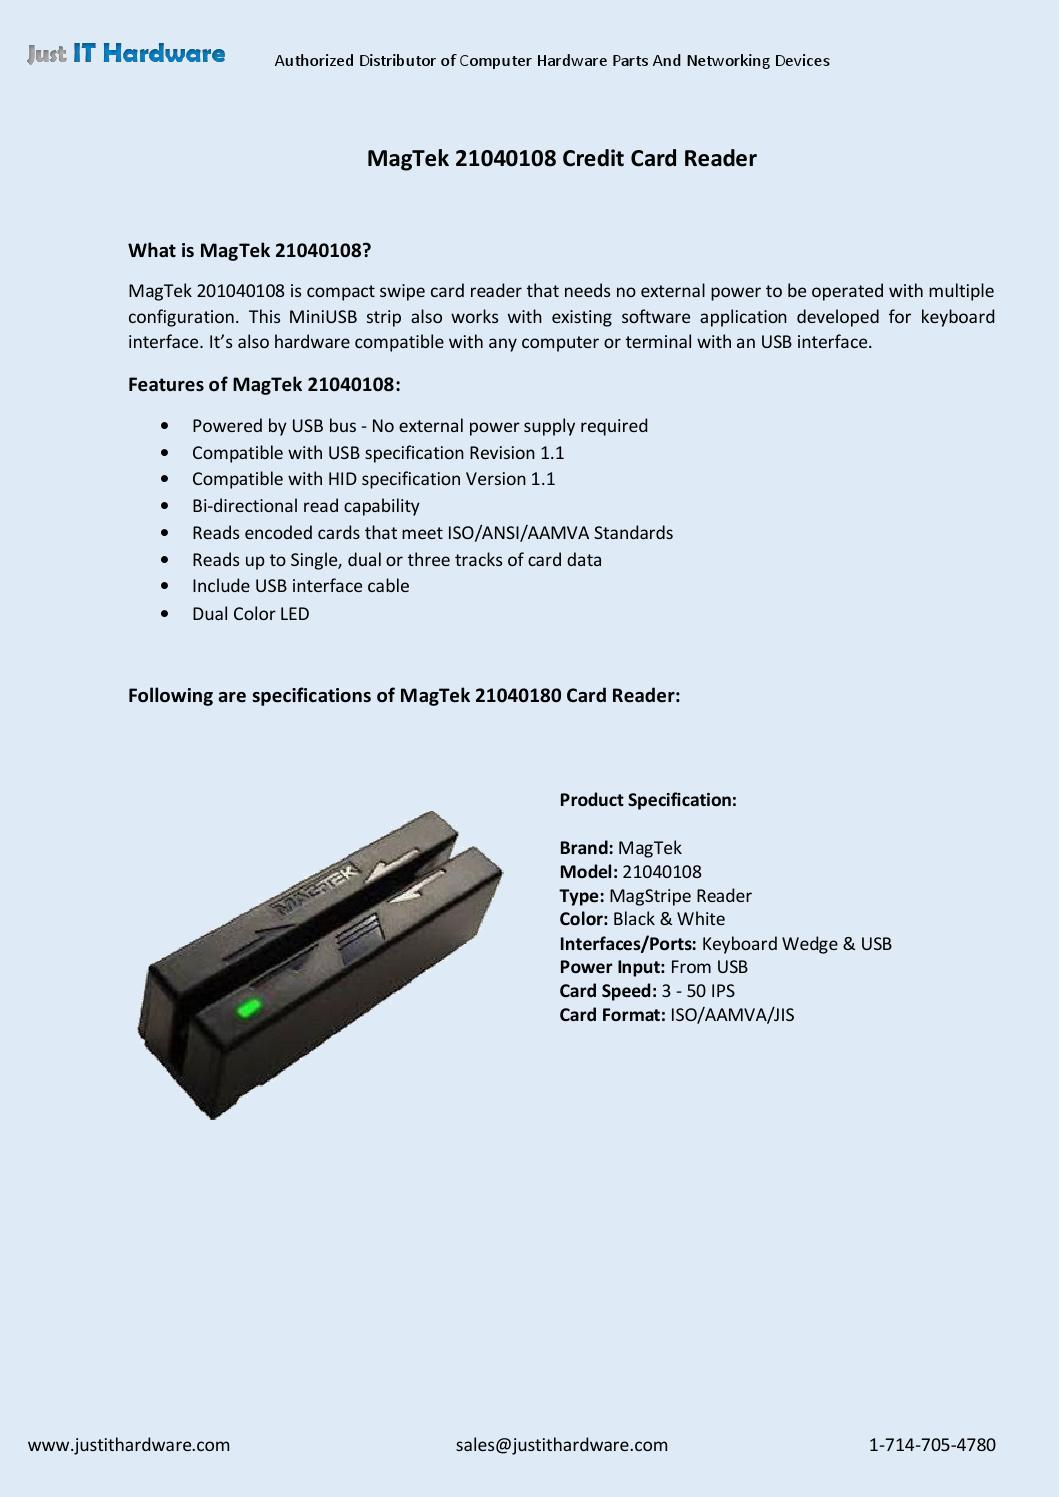 MagTek 21040108 Credit Card Reader by Just IT Hardware - issuu